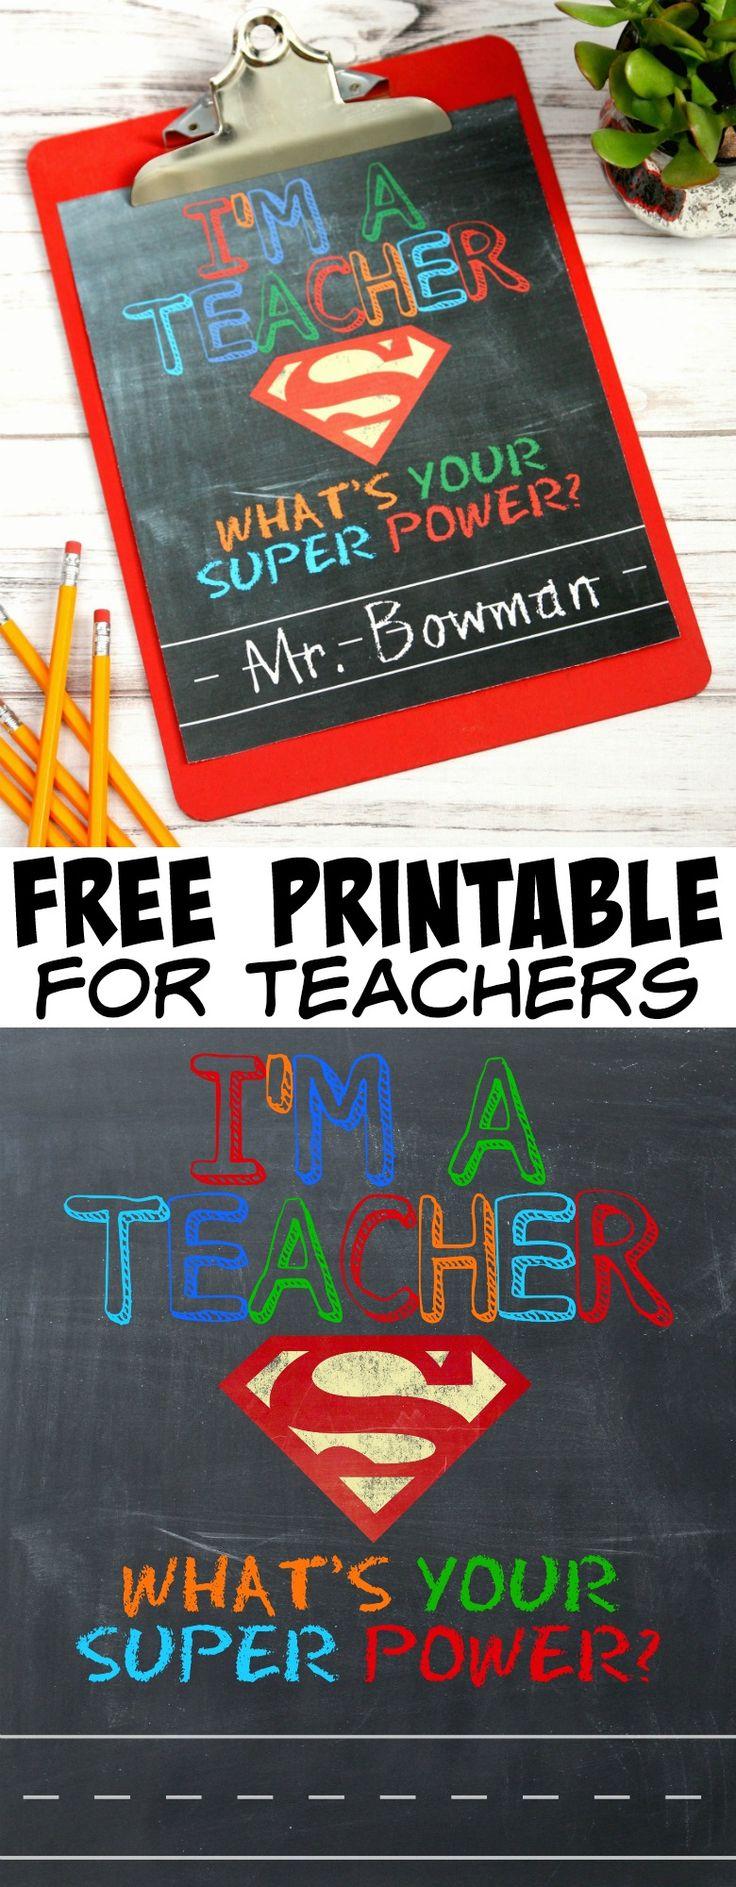 Free Printable for Teachers